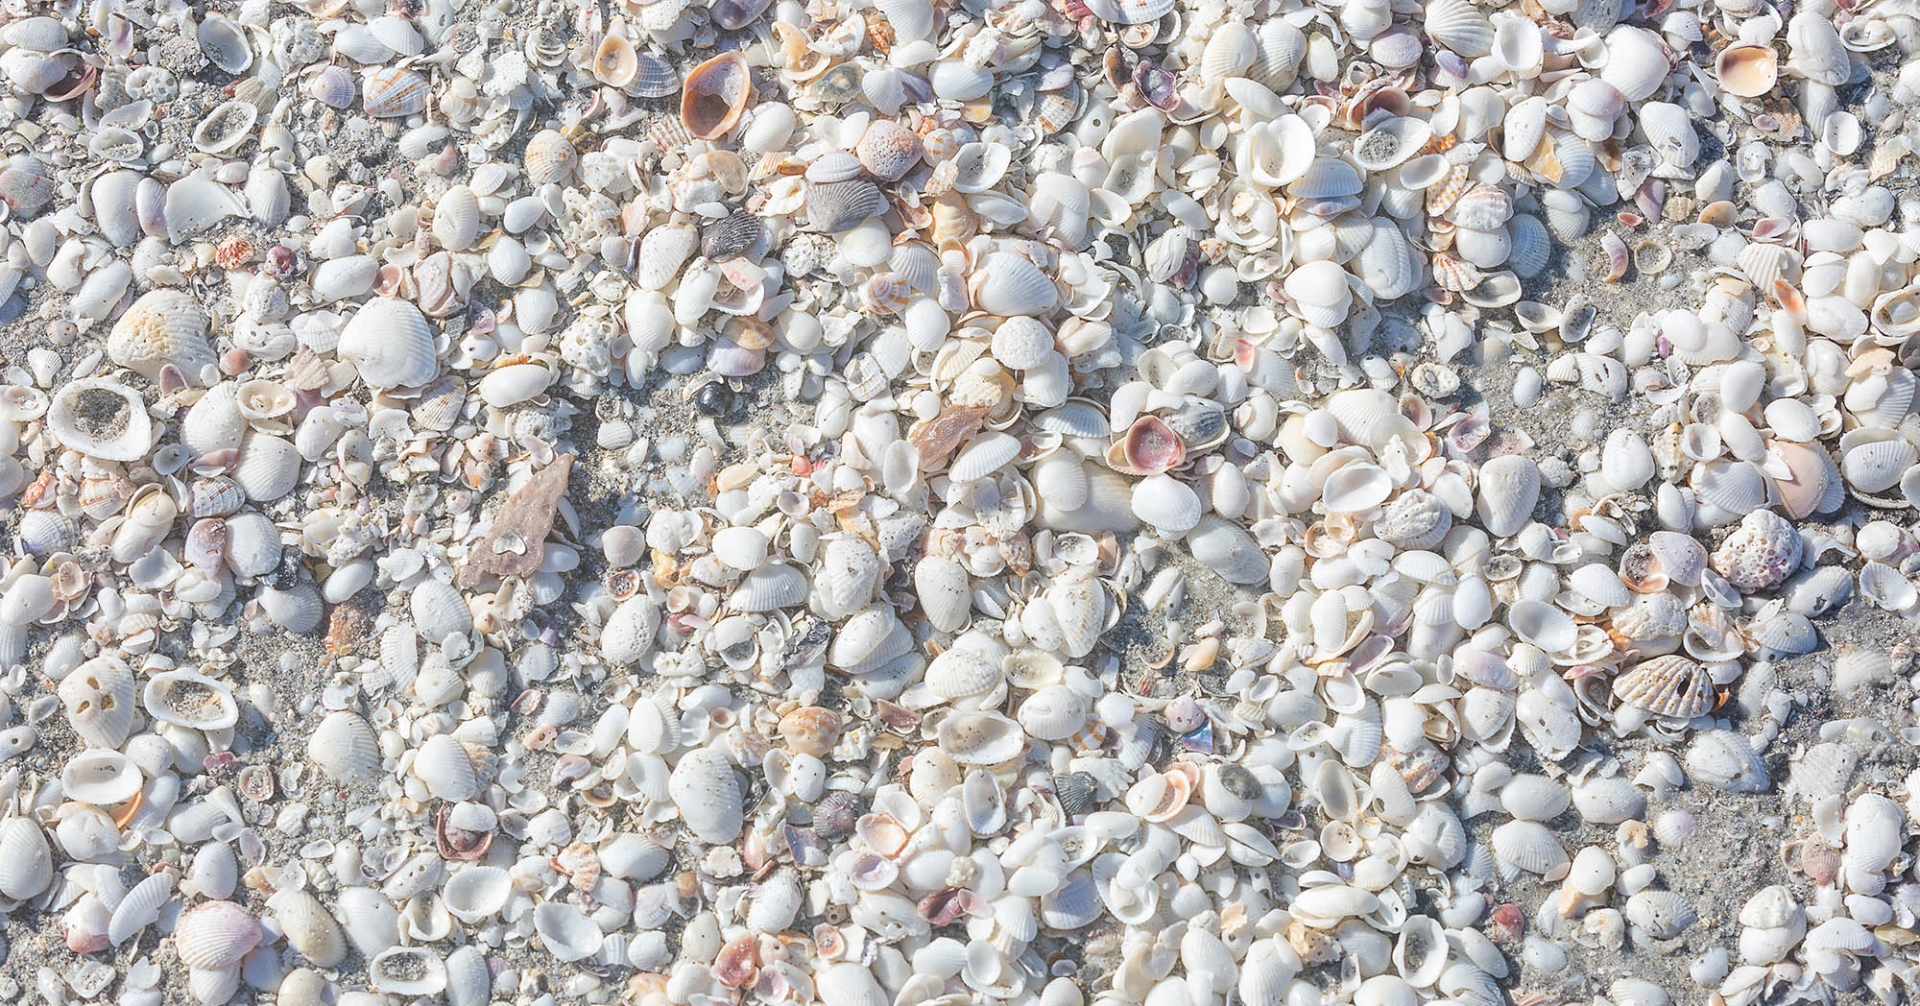 Shells of the beaches of Sanibel Island